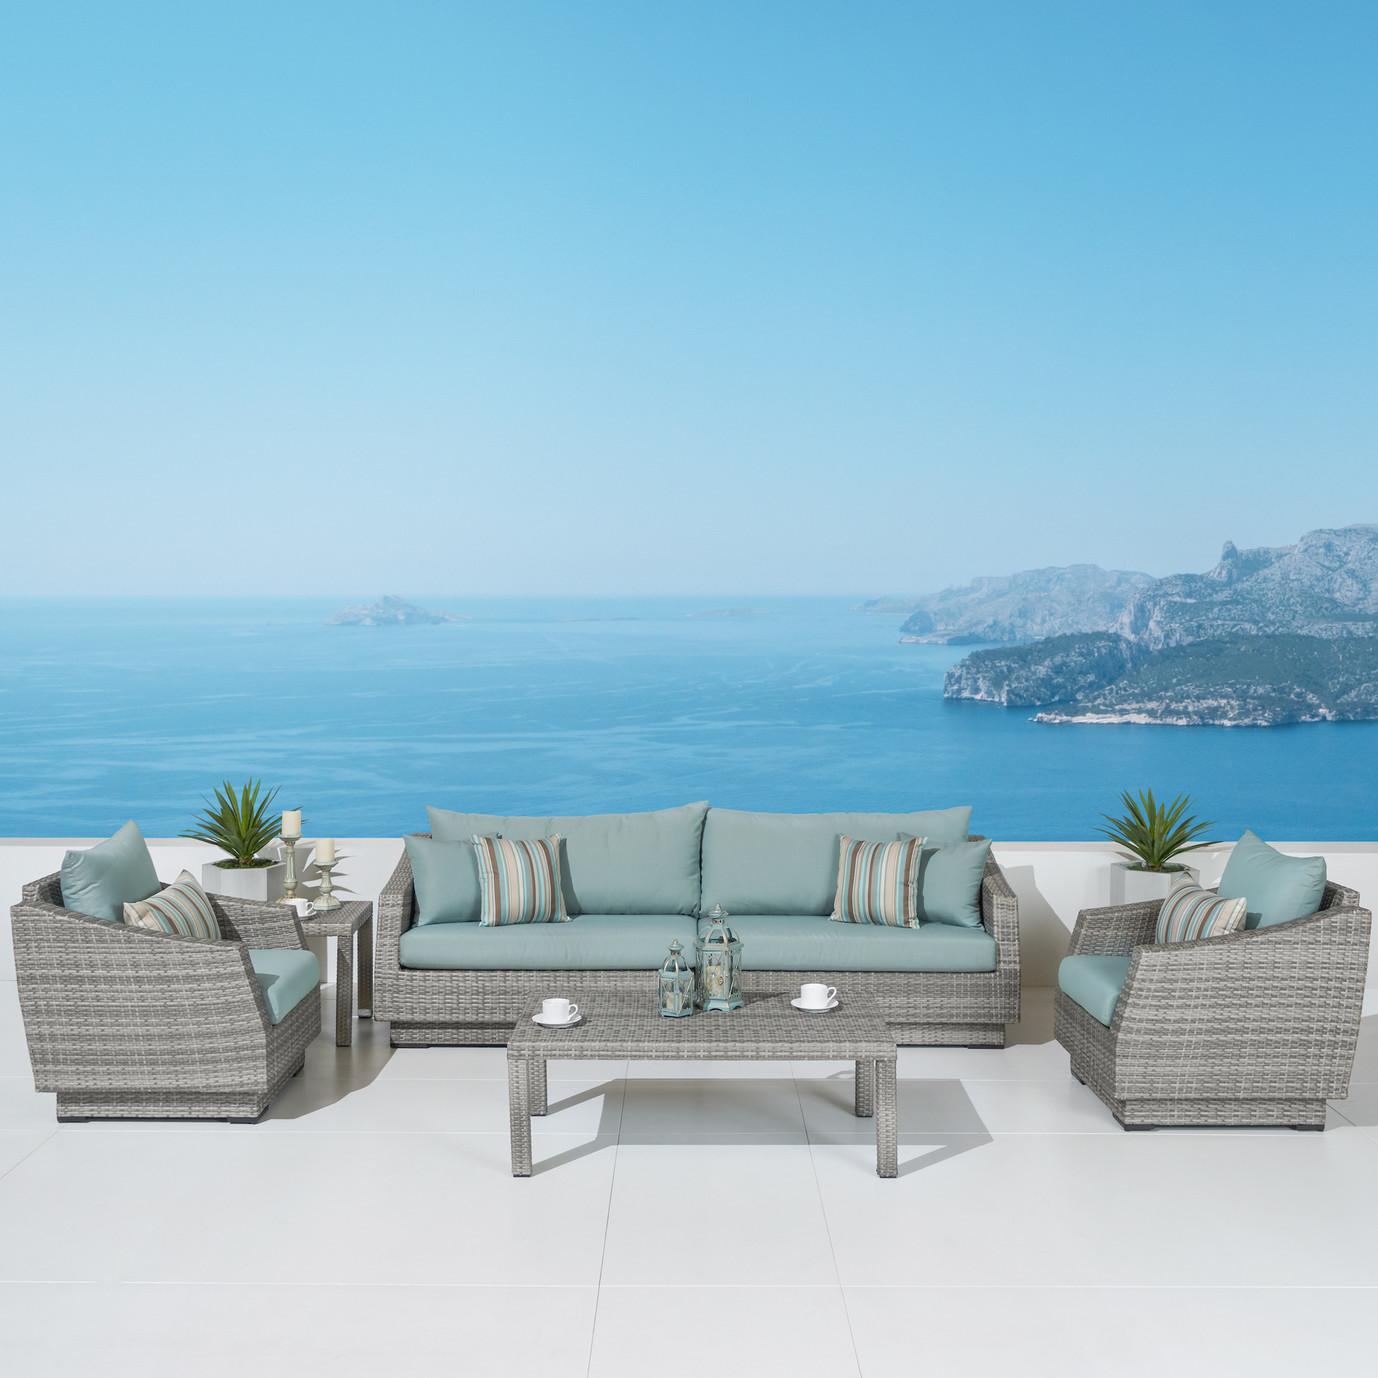 Cannes™ 6pc Sofa & Club Chair Set in Bliss Blue